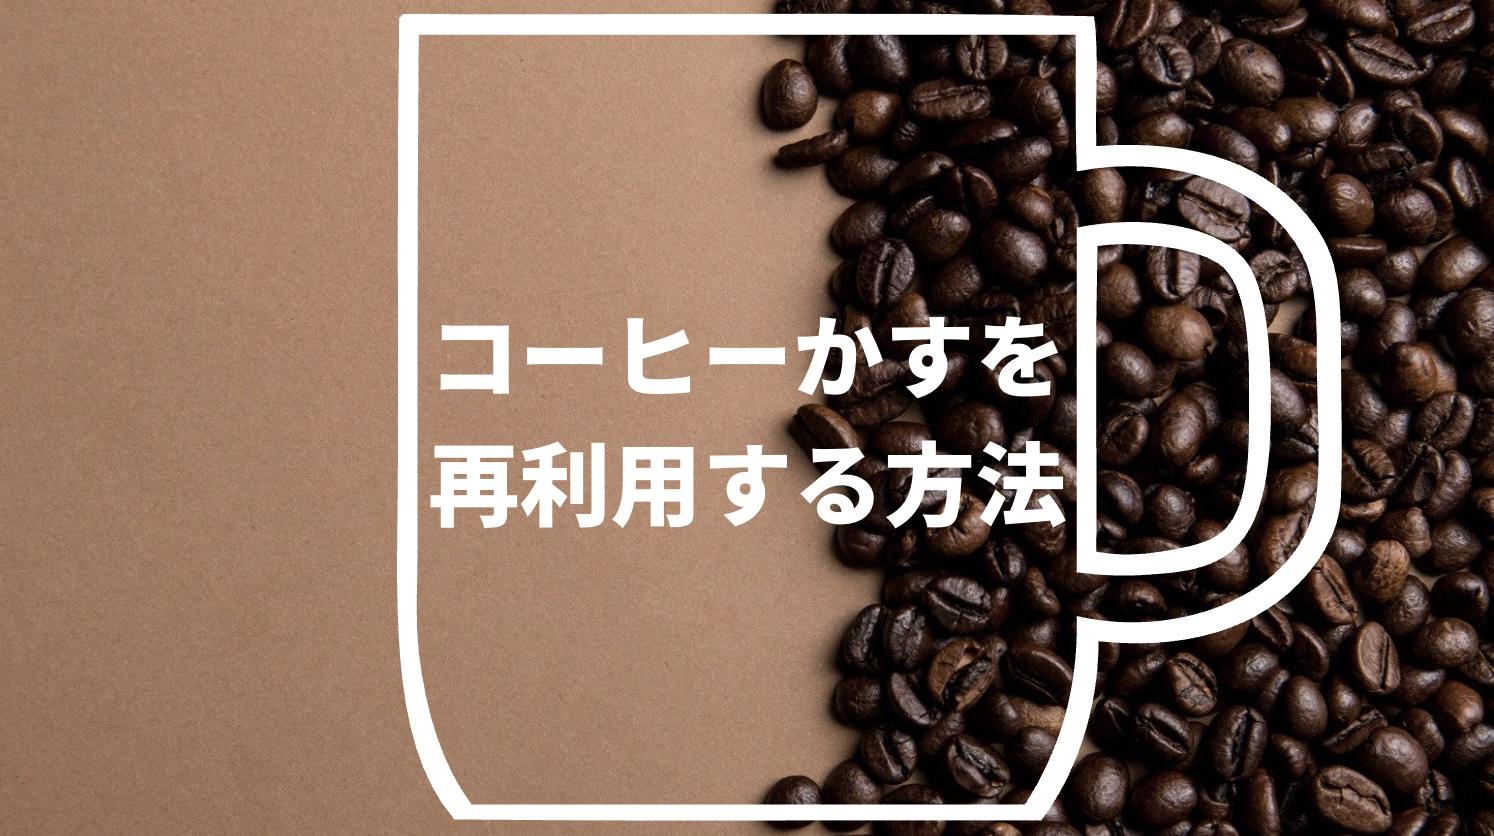 LIFE HACK|『コーヒーかす』を再利用する3つの方法